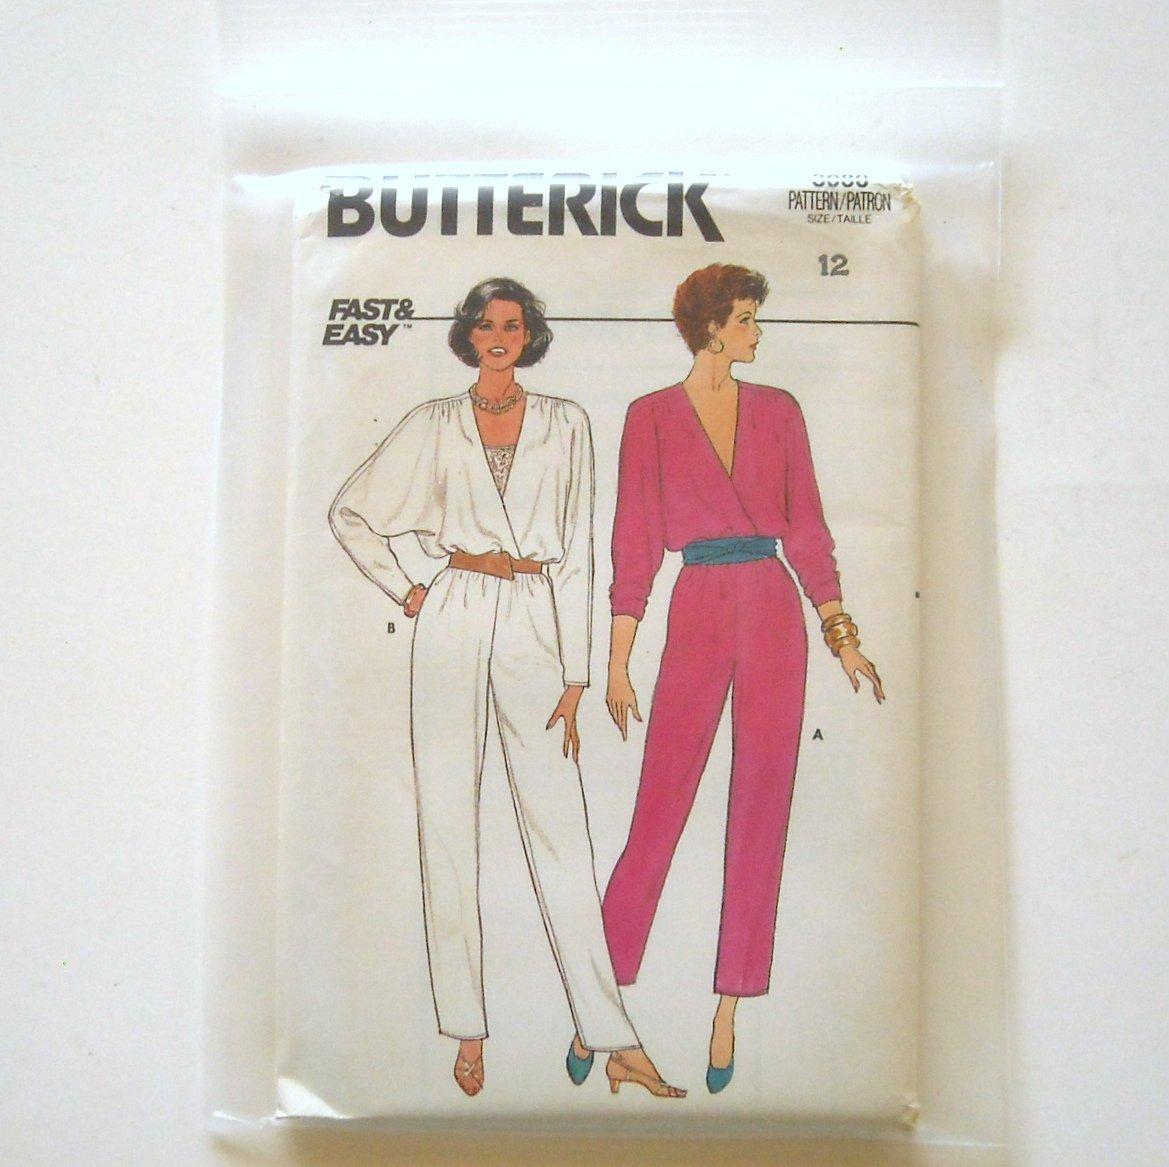 Misses Jumpsuit Top Size 12 Vintage Butterick Sewing Pattern 3080